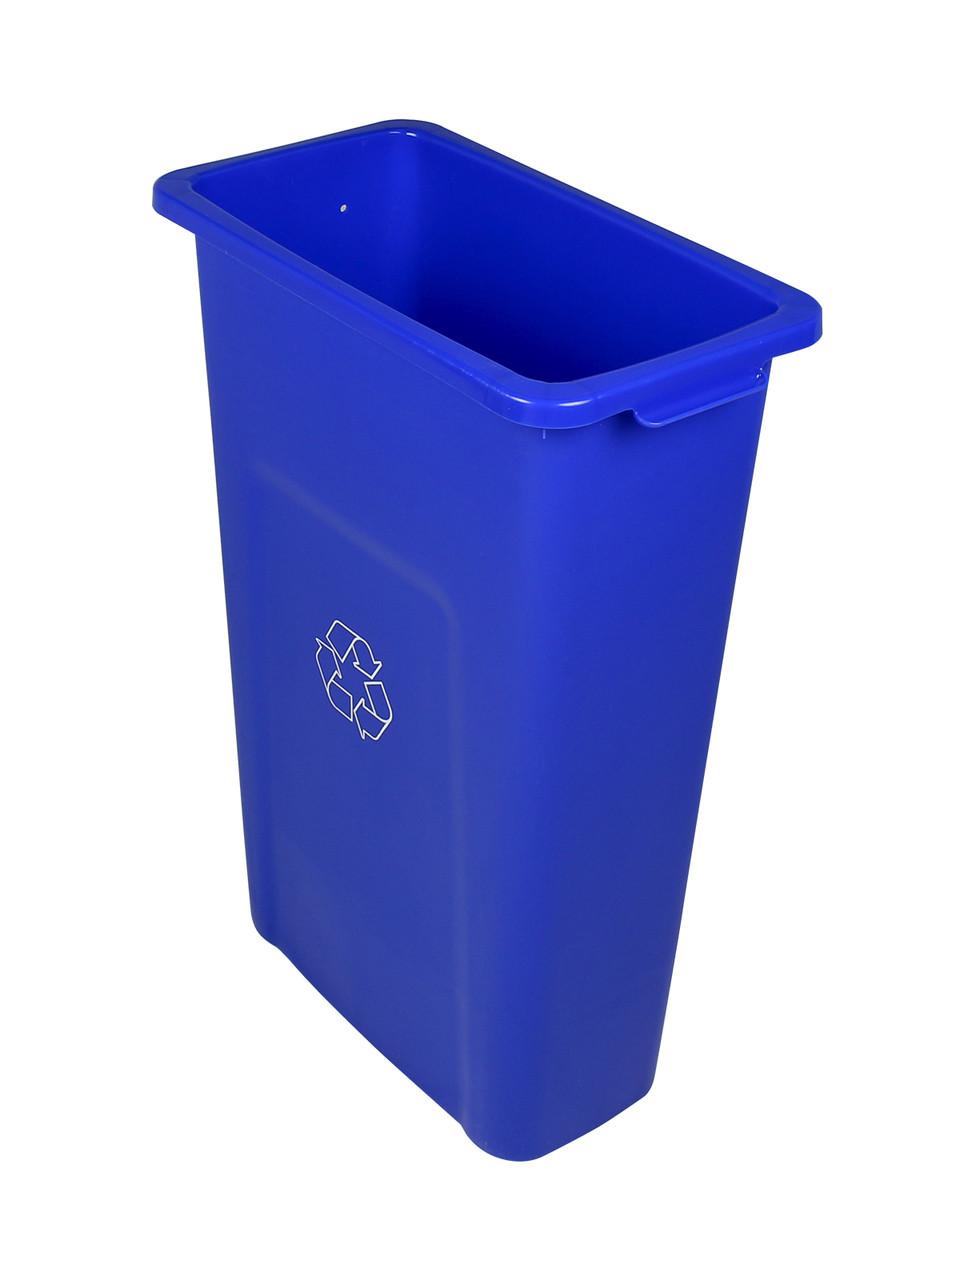 23 Gallon Skinny Plastic Home & Office Recycling Bin Blue